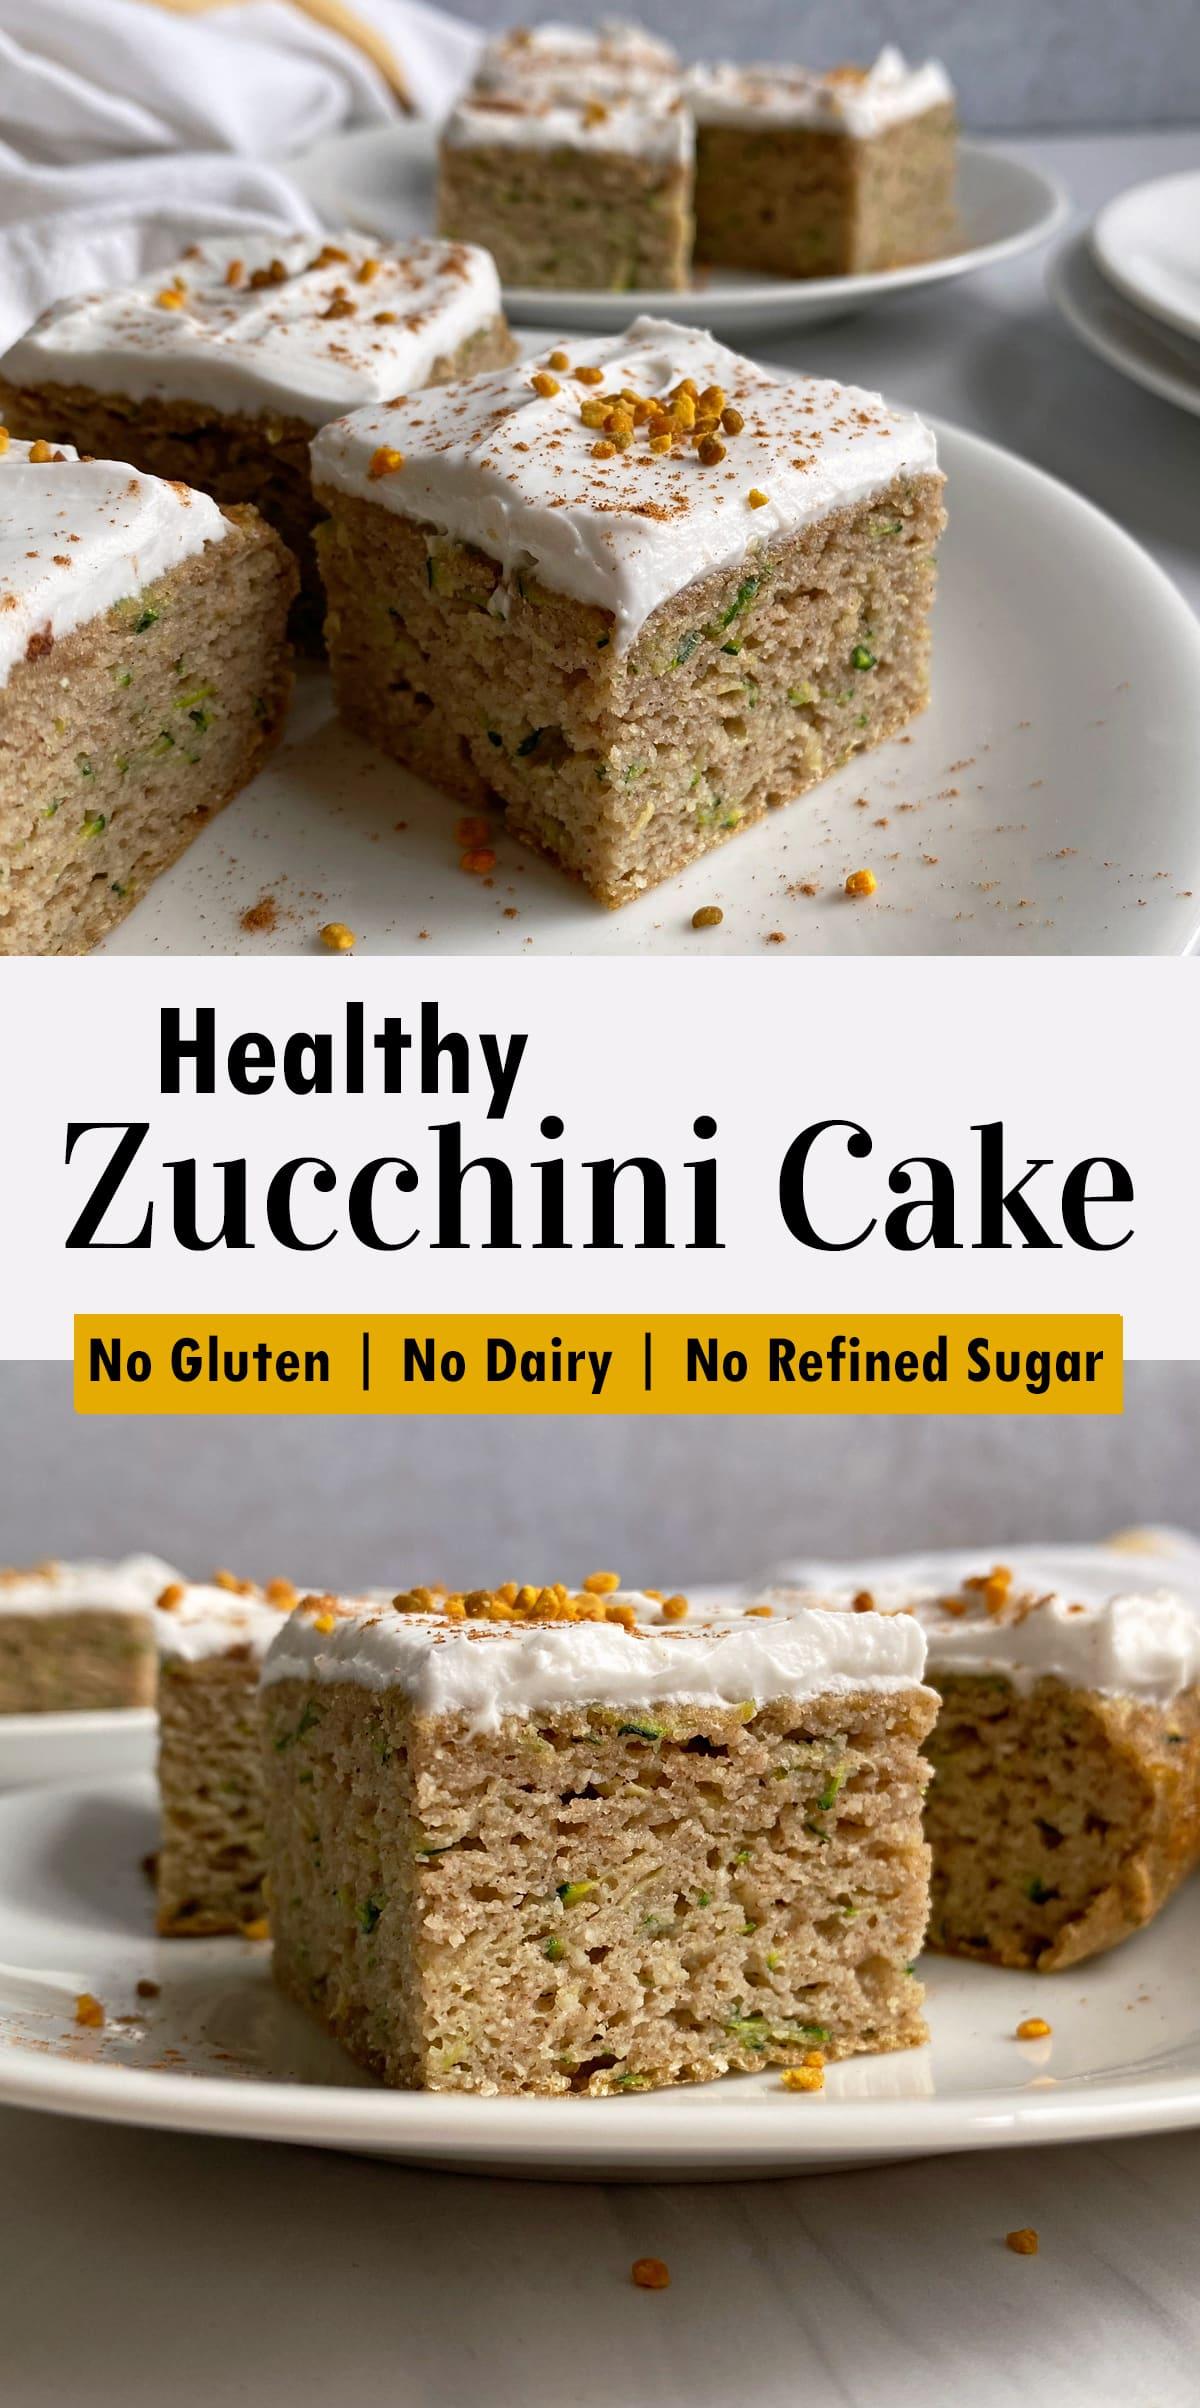 Healthy-gluten-free-zucchini-cake-pinterest-image